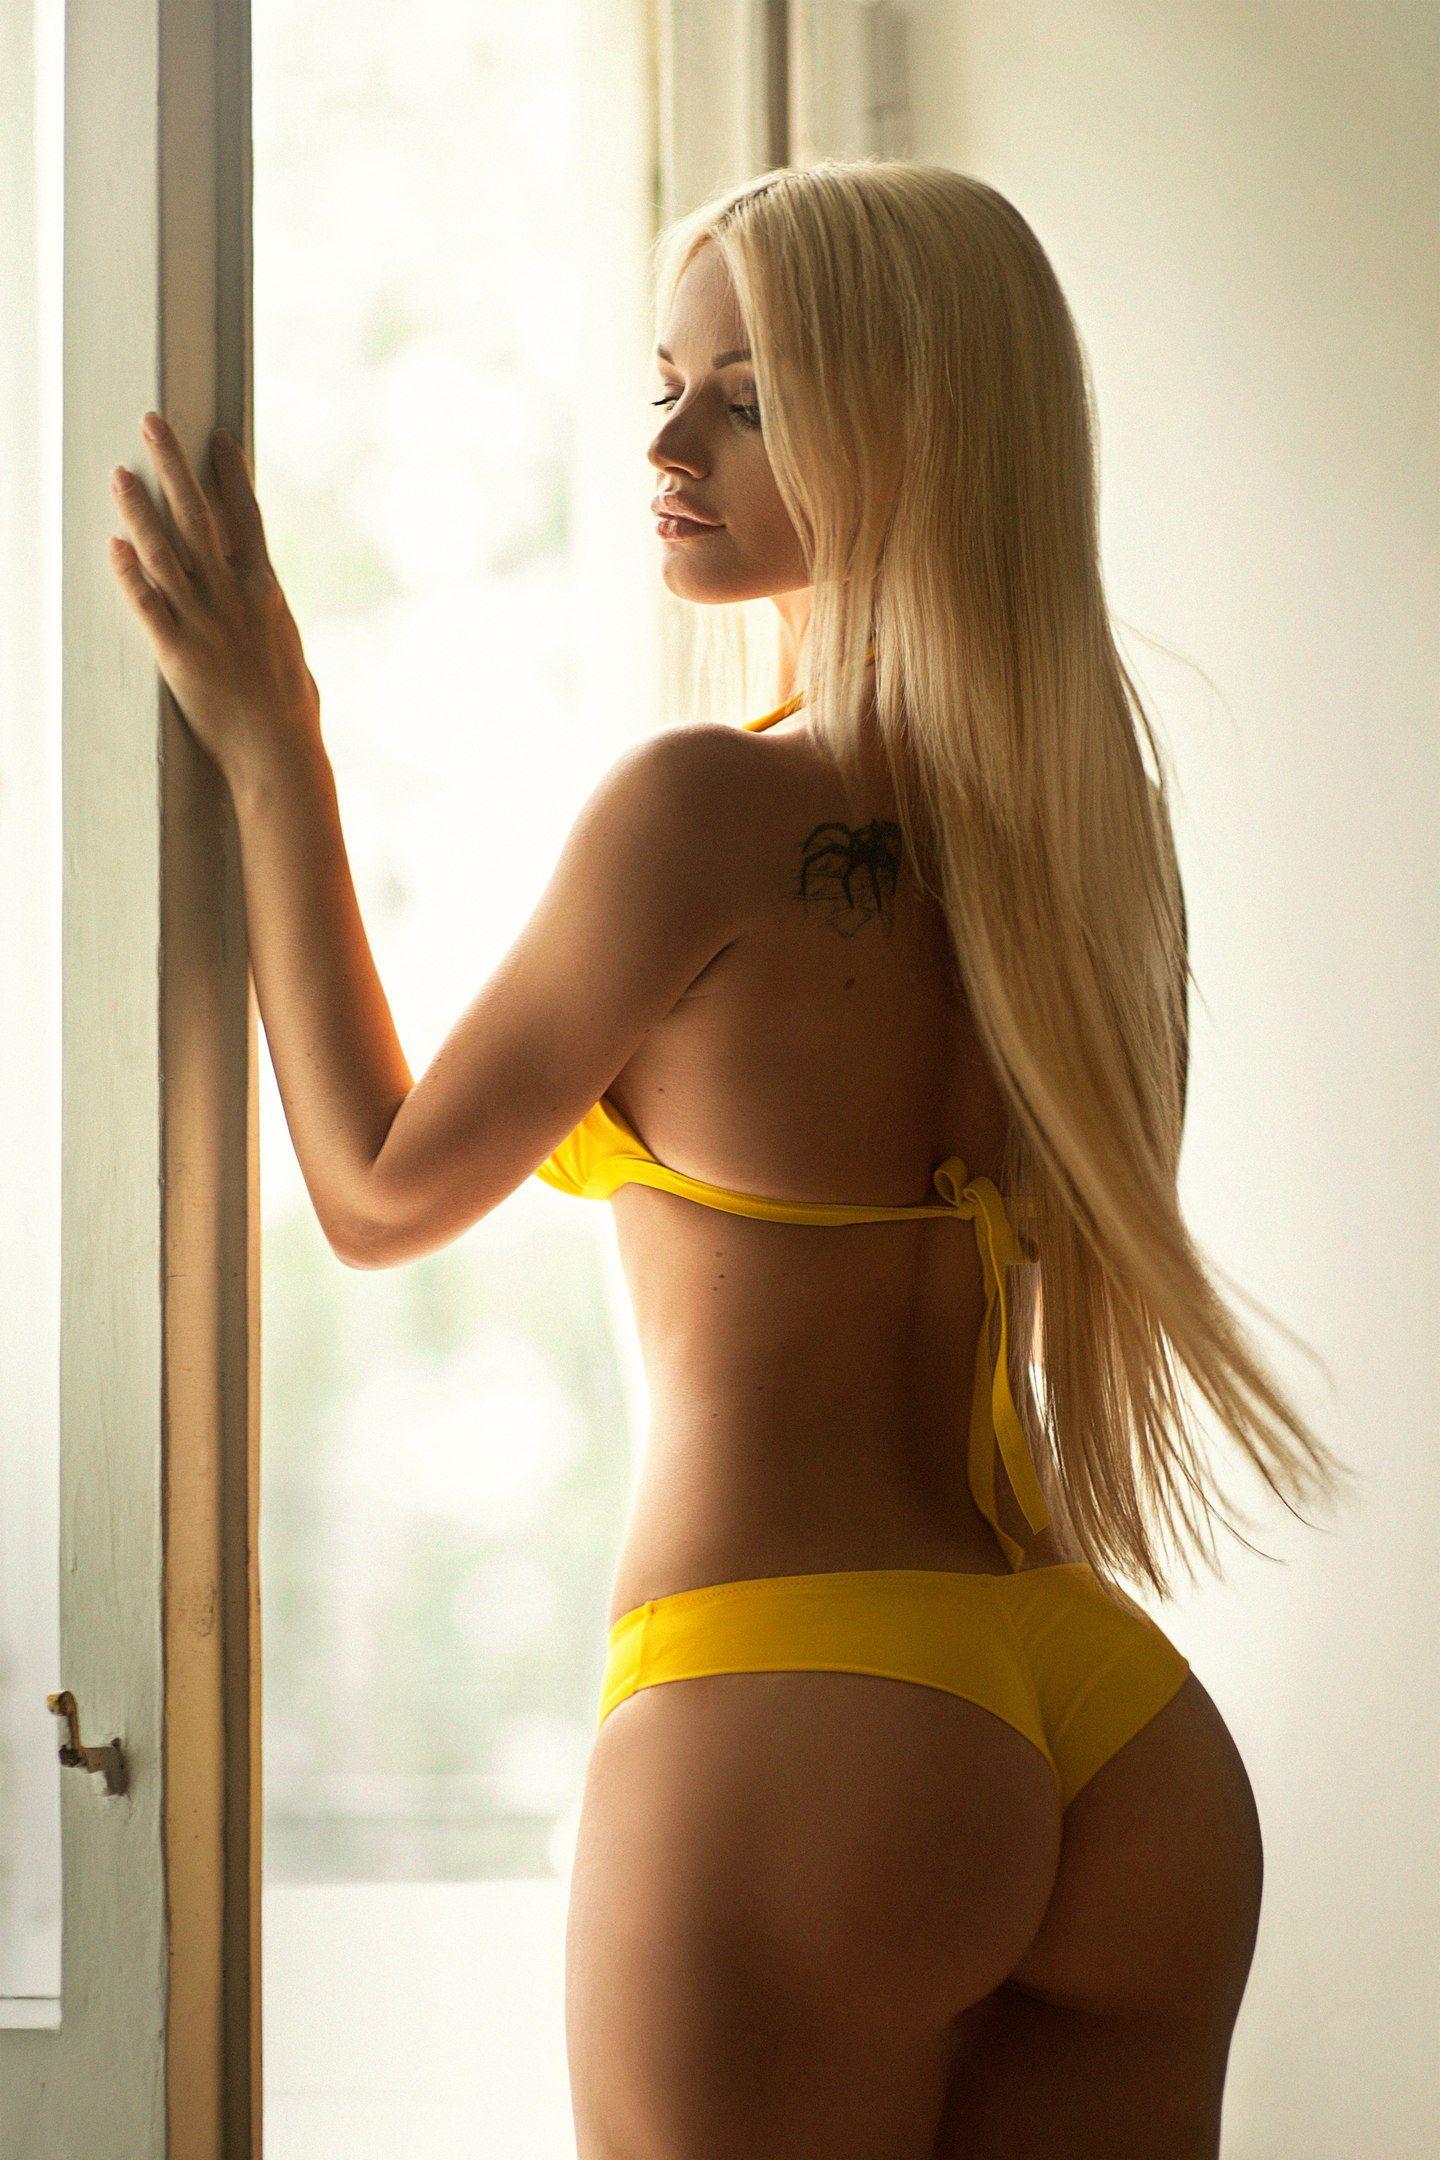 asses ukraine escort models